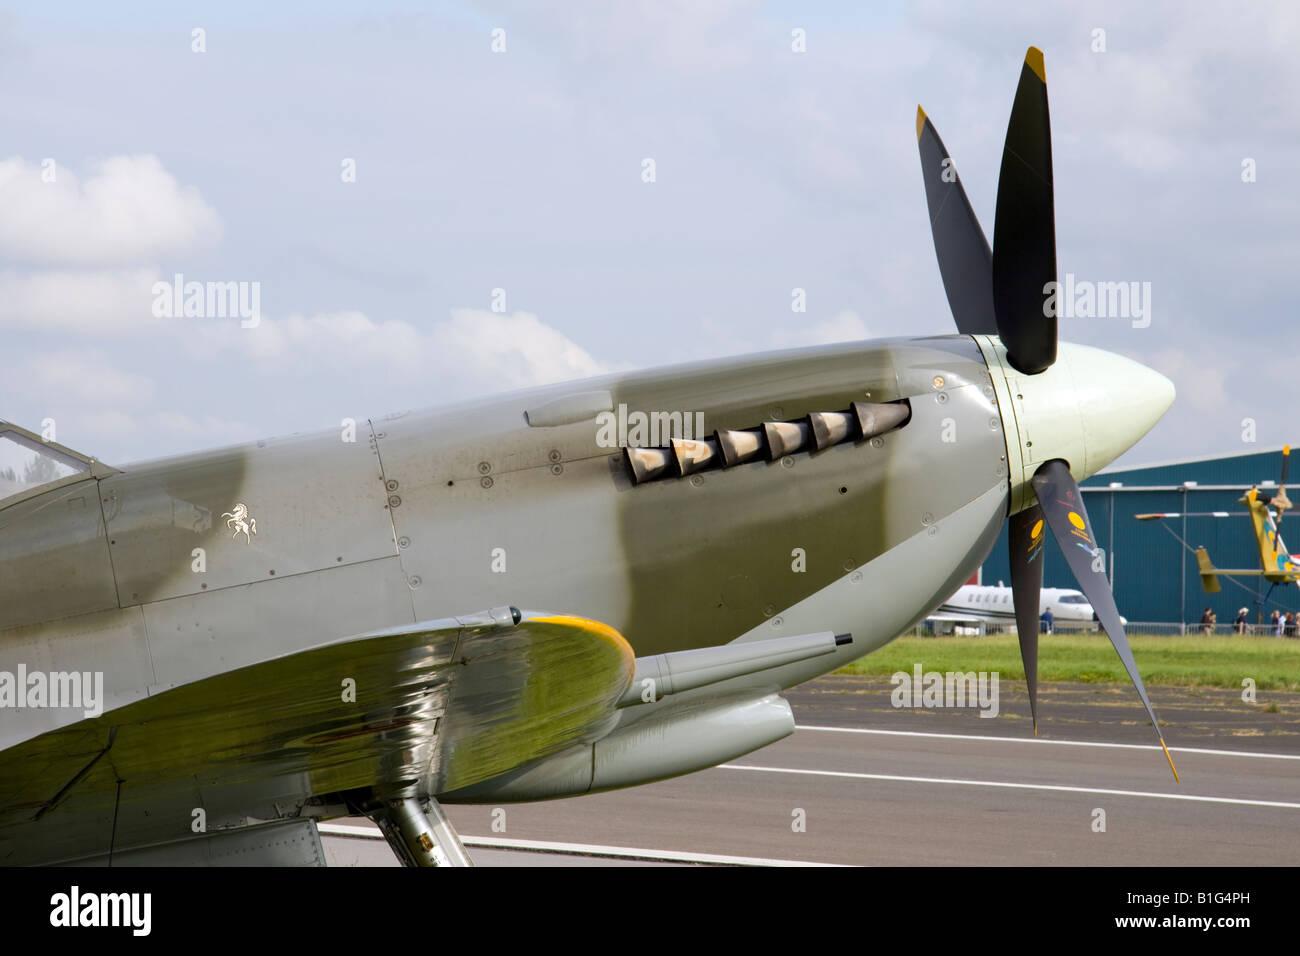 The Spirit of Kent Spitfire TA805 at the Biggin Hill Air Fair, Kent, England, UK.  7th June 2008 - Stock Image